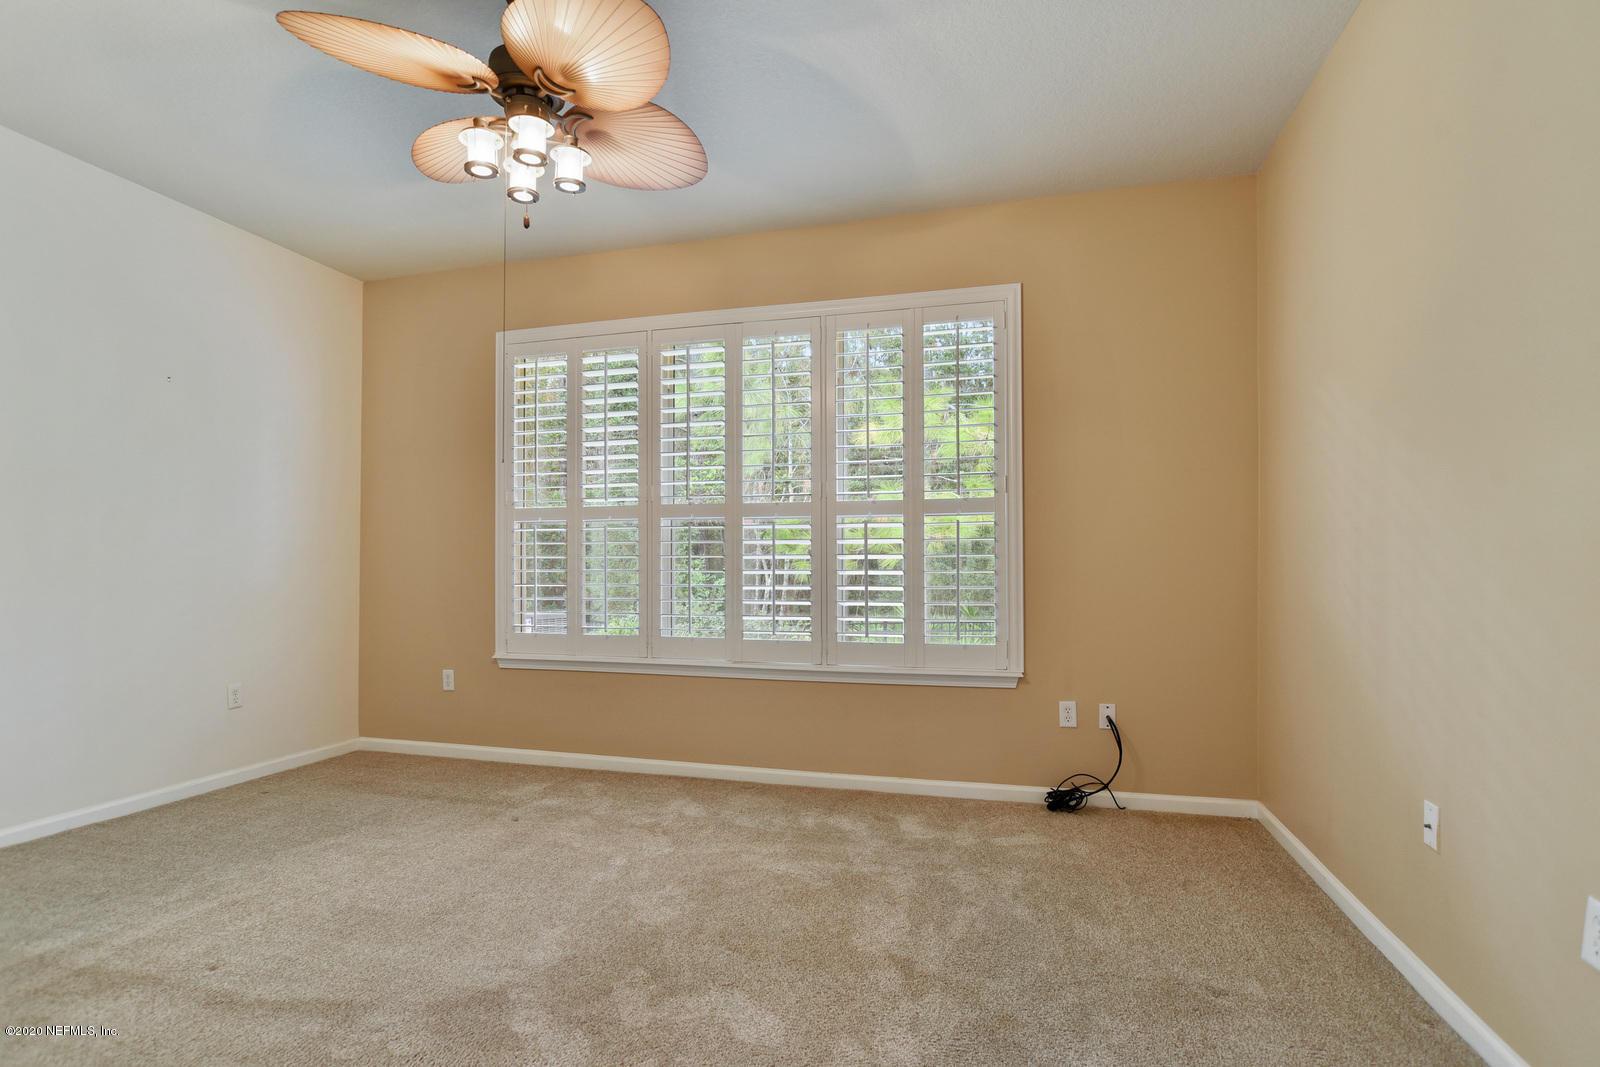 9264 ROSEWATER, JACKSONVILLE, FLORIDA 32256, 3 Bedrooms Bedrooms, ,3 BathroomsBathrooms,Residential,For sale,ROSEWATER,1082018